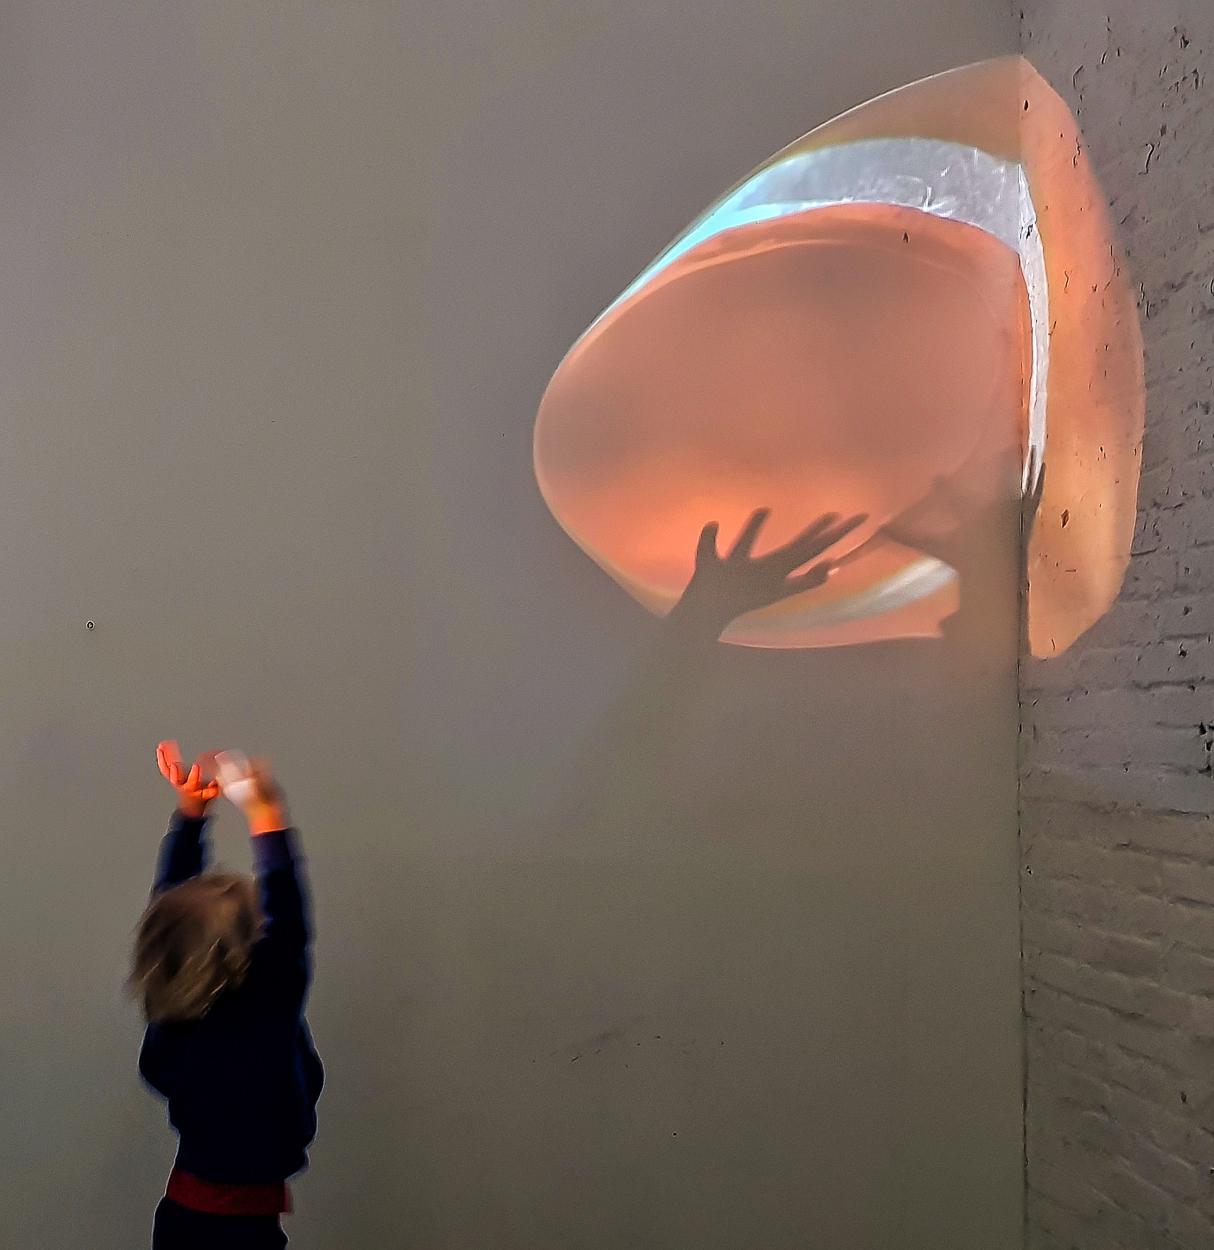 Linda Loh NARS Open Studios NYC 2018 Installation View